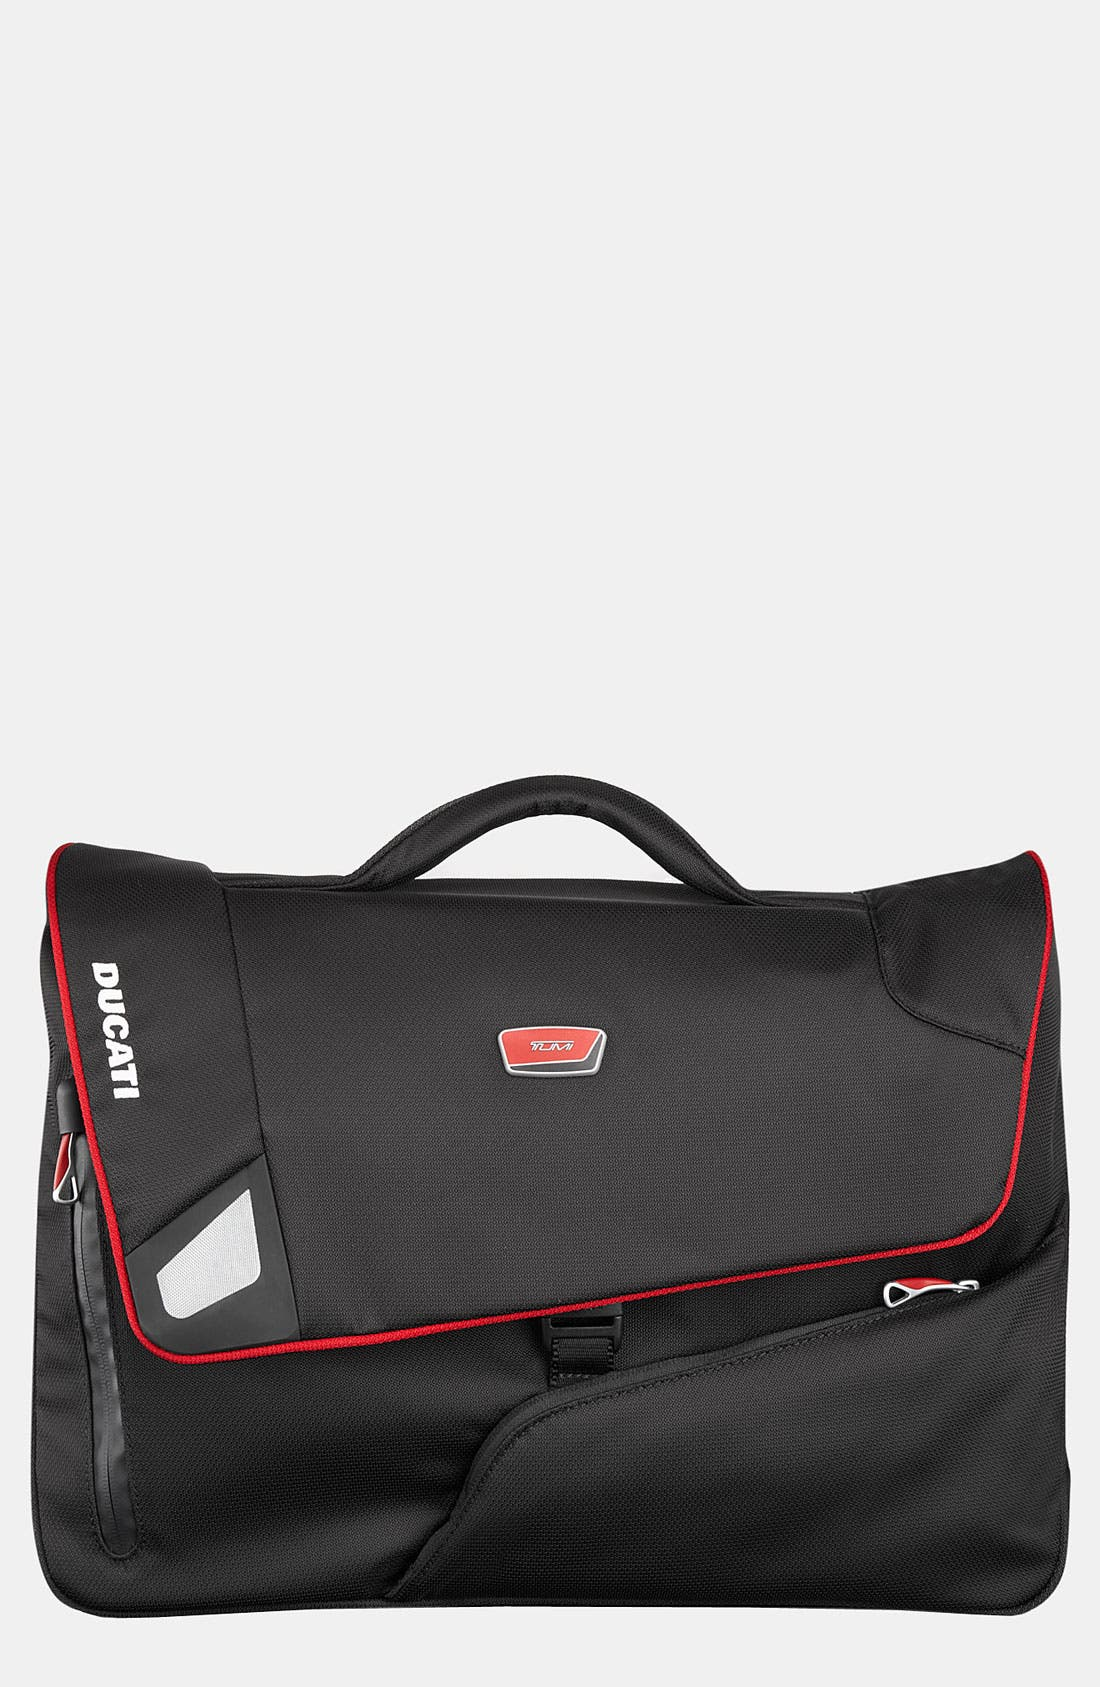 Main Image - Tumi 'Ducati - Accelerator' Slim Laptop Briefcase